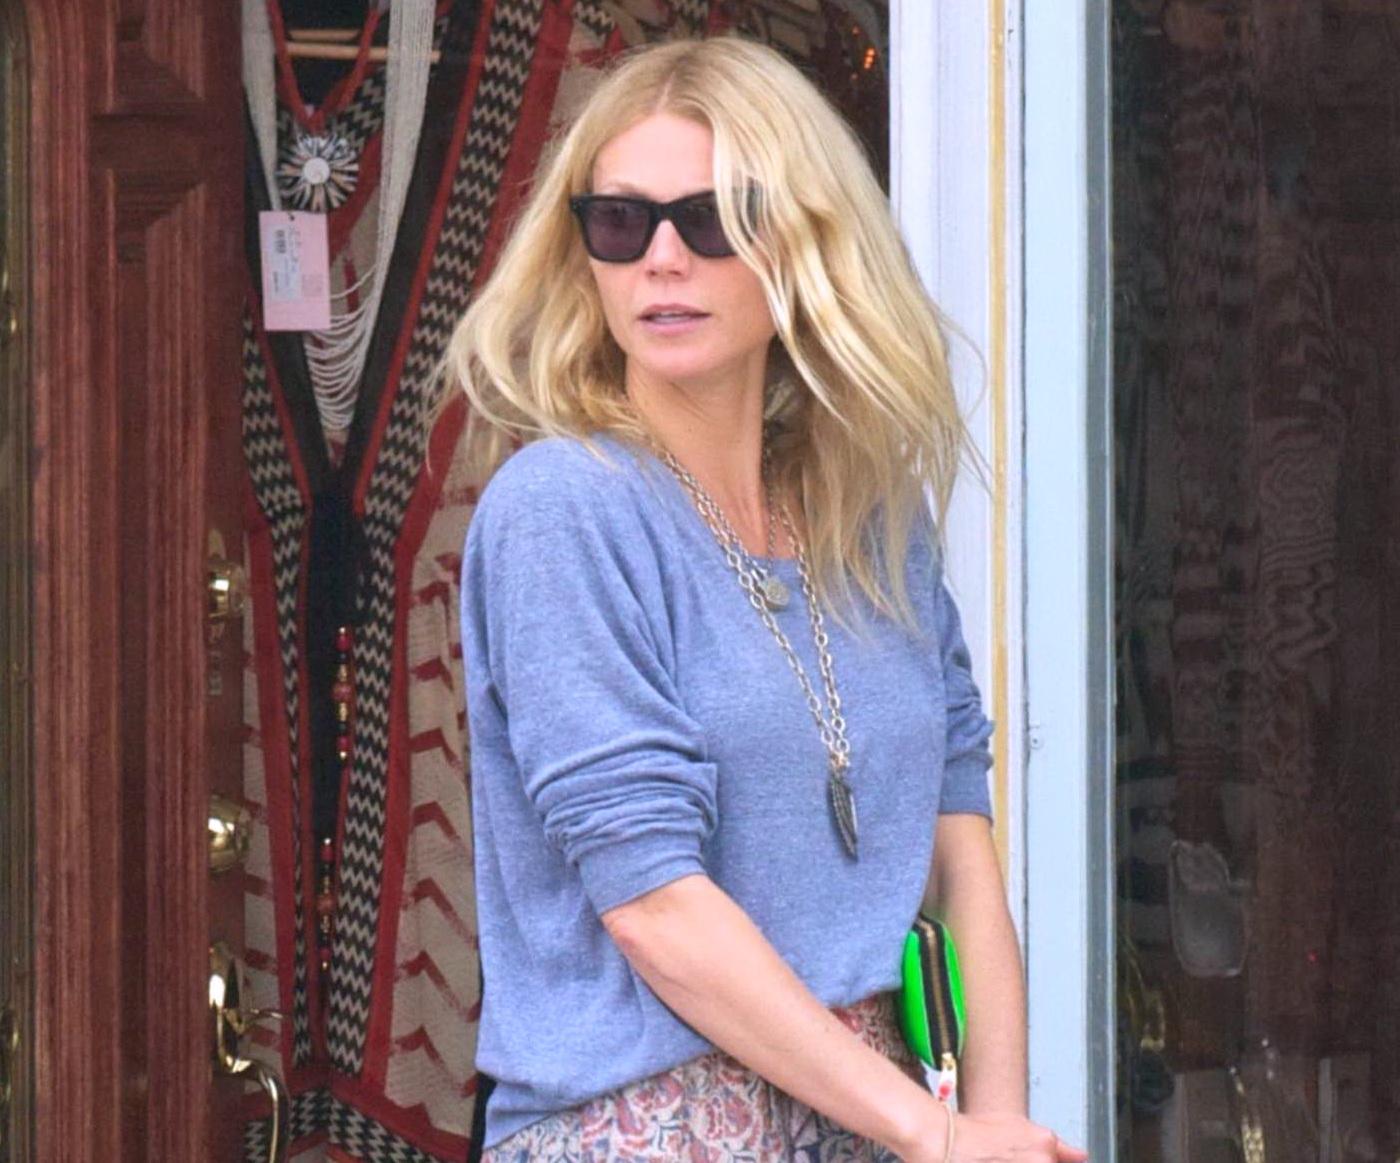 http://3.bp.blogspot.com/-Dg0jSreA97M/T6jr1so6gWI/AAAAAAAAEfU/INVcmQ6Cm2w/s1600/Gwyneth+Paltrow-Beverly-Hills-2012-00.jpg